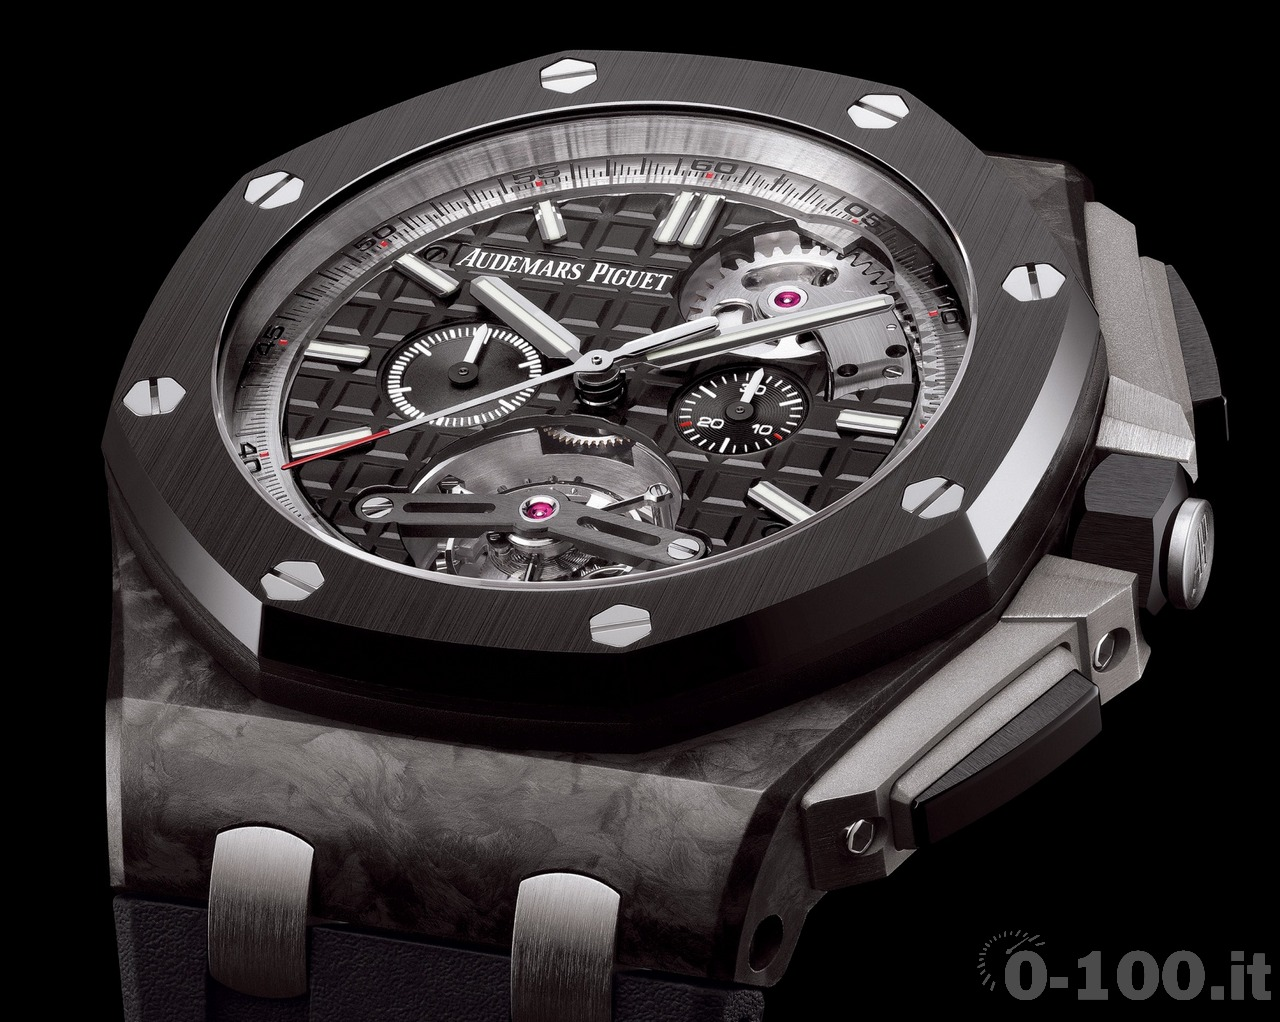 anteprima-watches-wonders-2014-hong-kong-audemars-piguet-royal-oak-offshore-tourbillon-cronografo-automatico-0-100_2